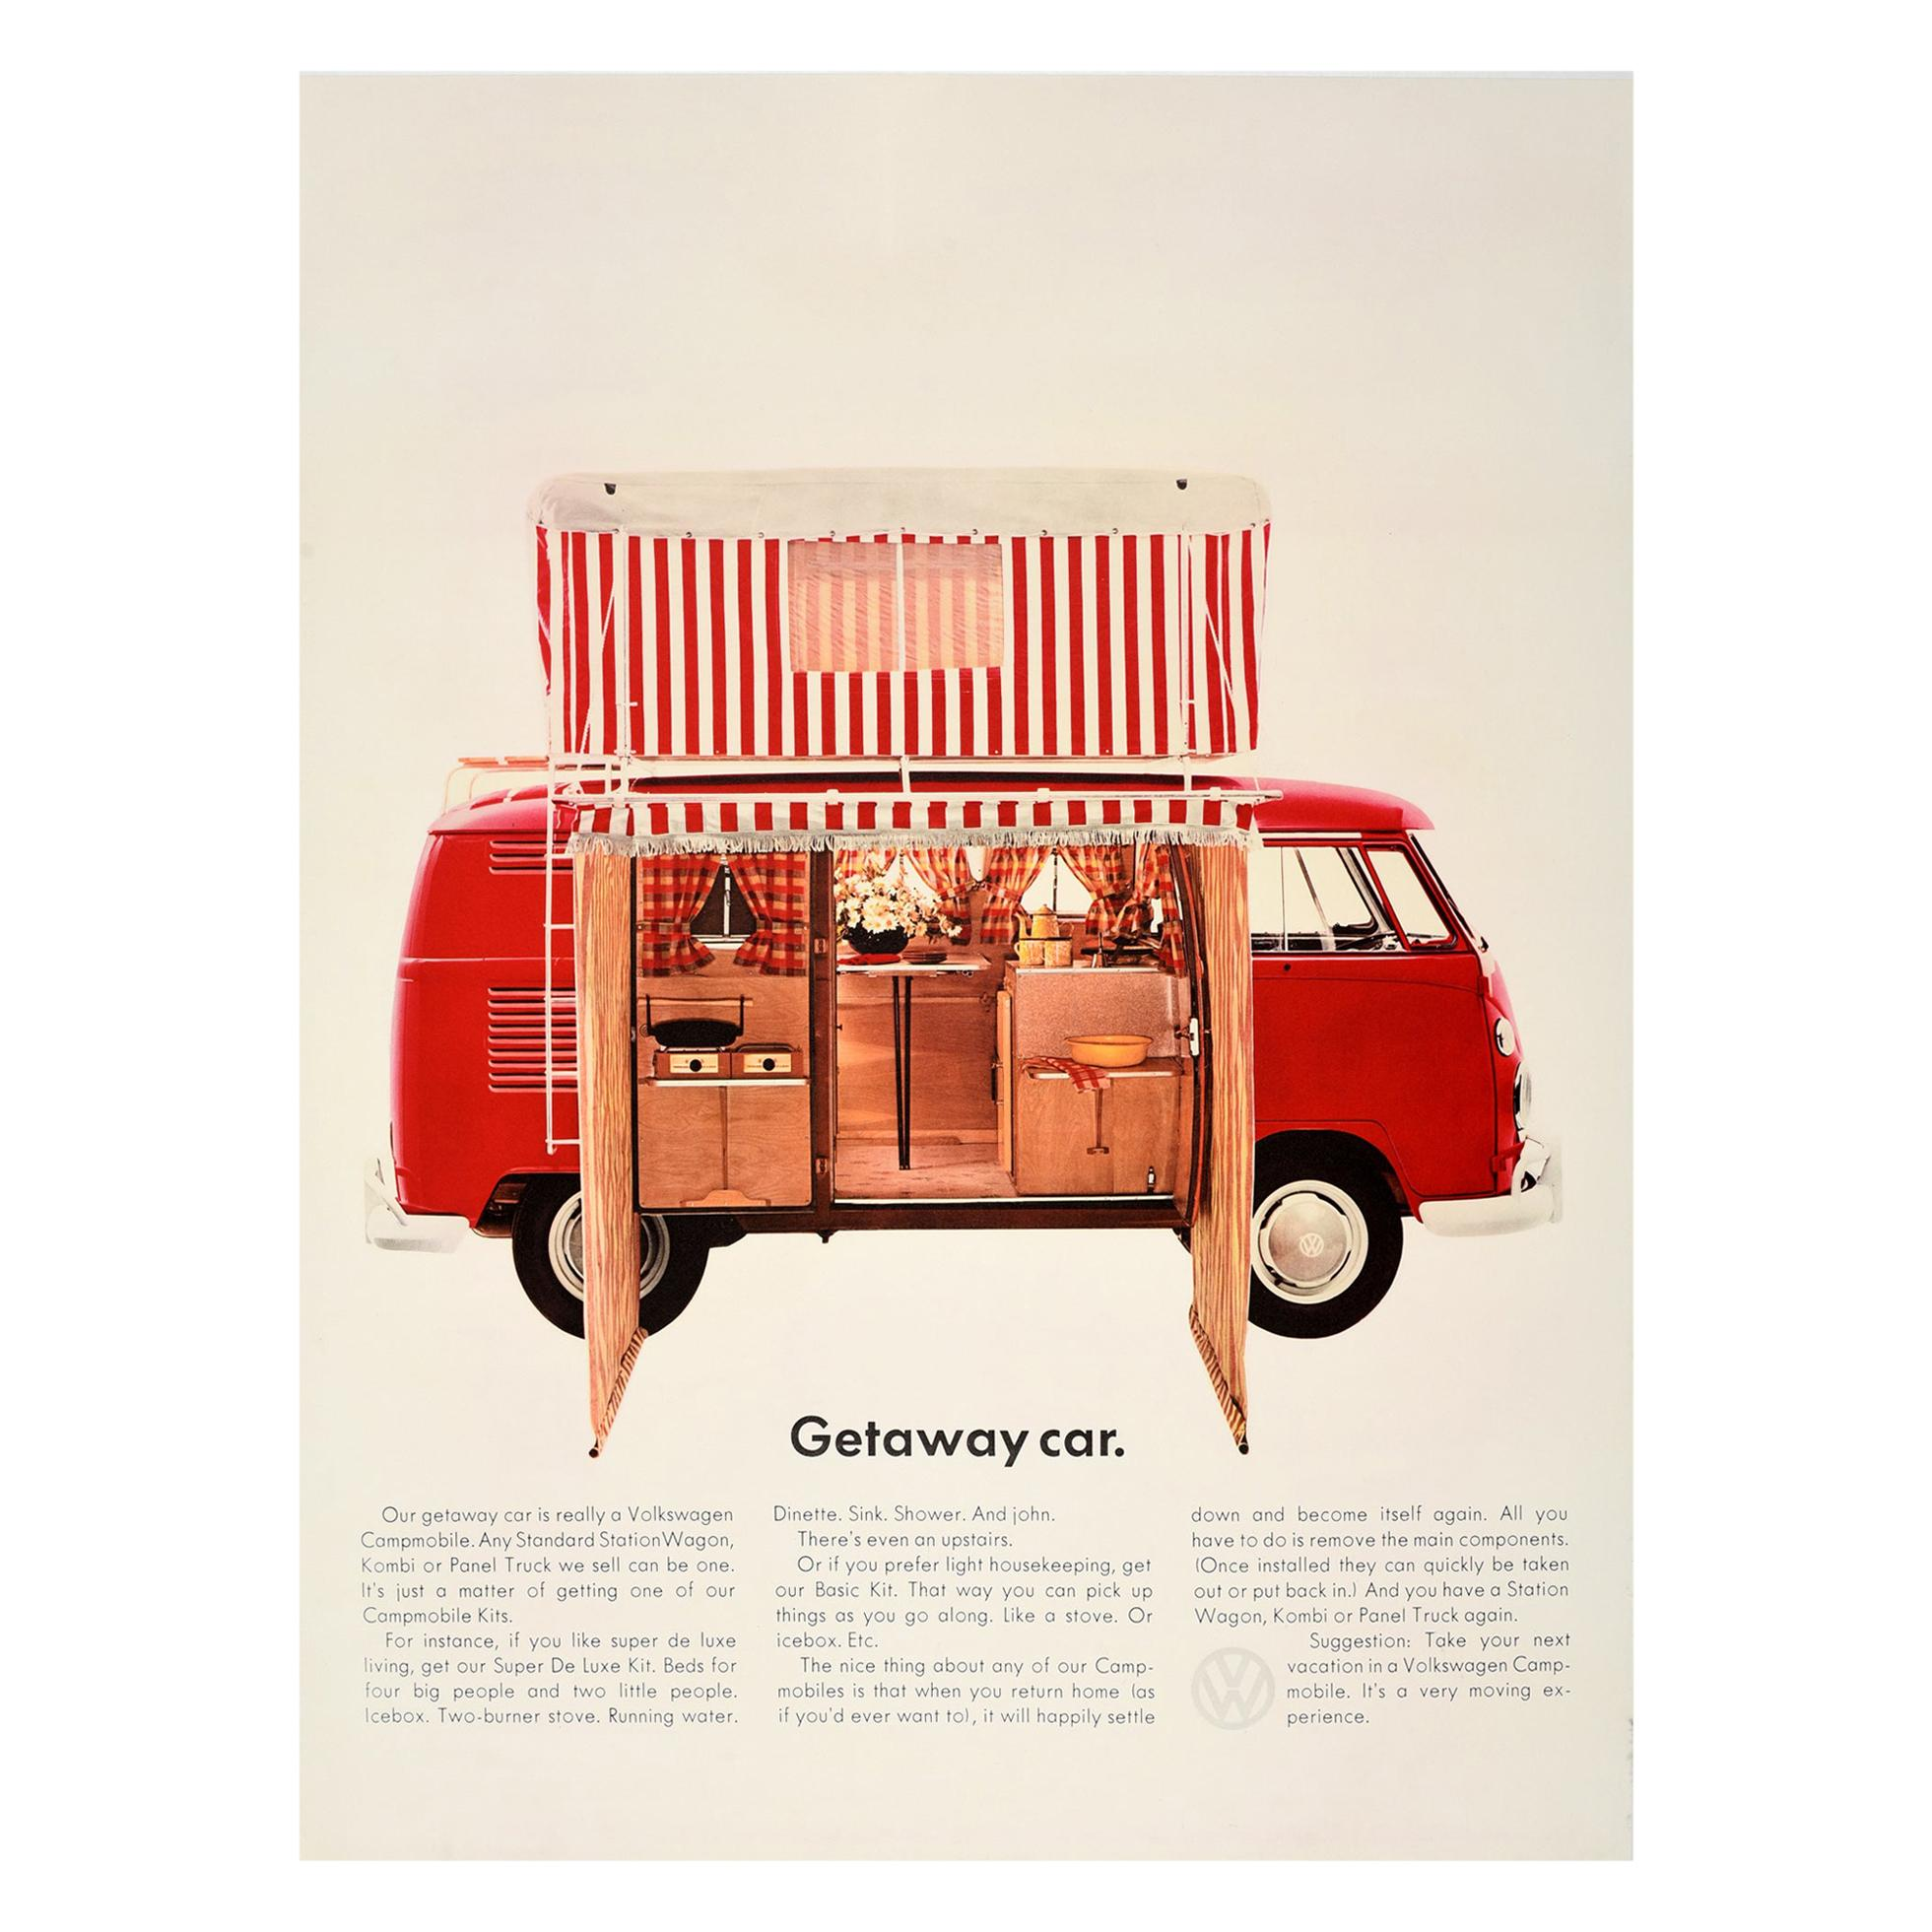 Original Vintage Volkswagen Poster Getaway Car VW Campmobile Station Wagon Kombi